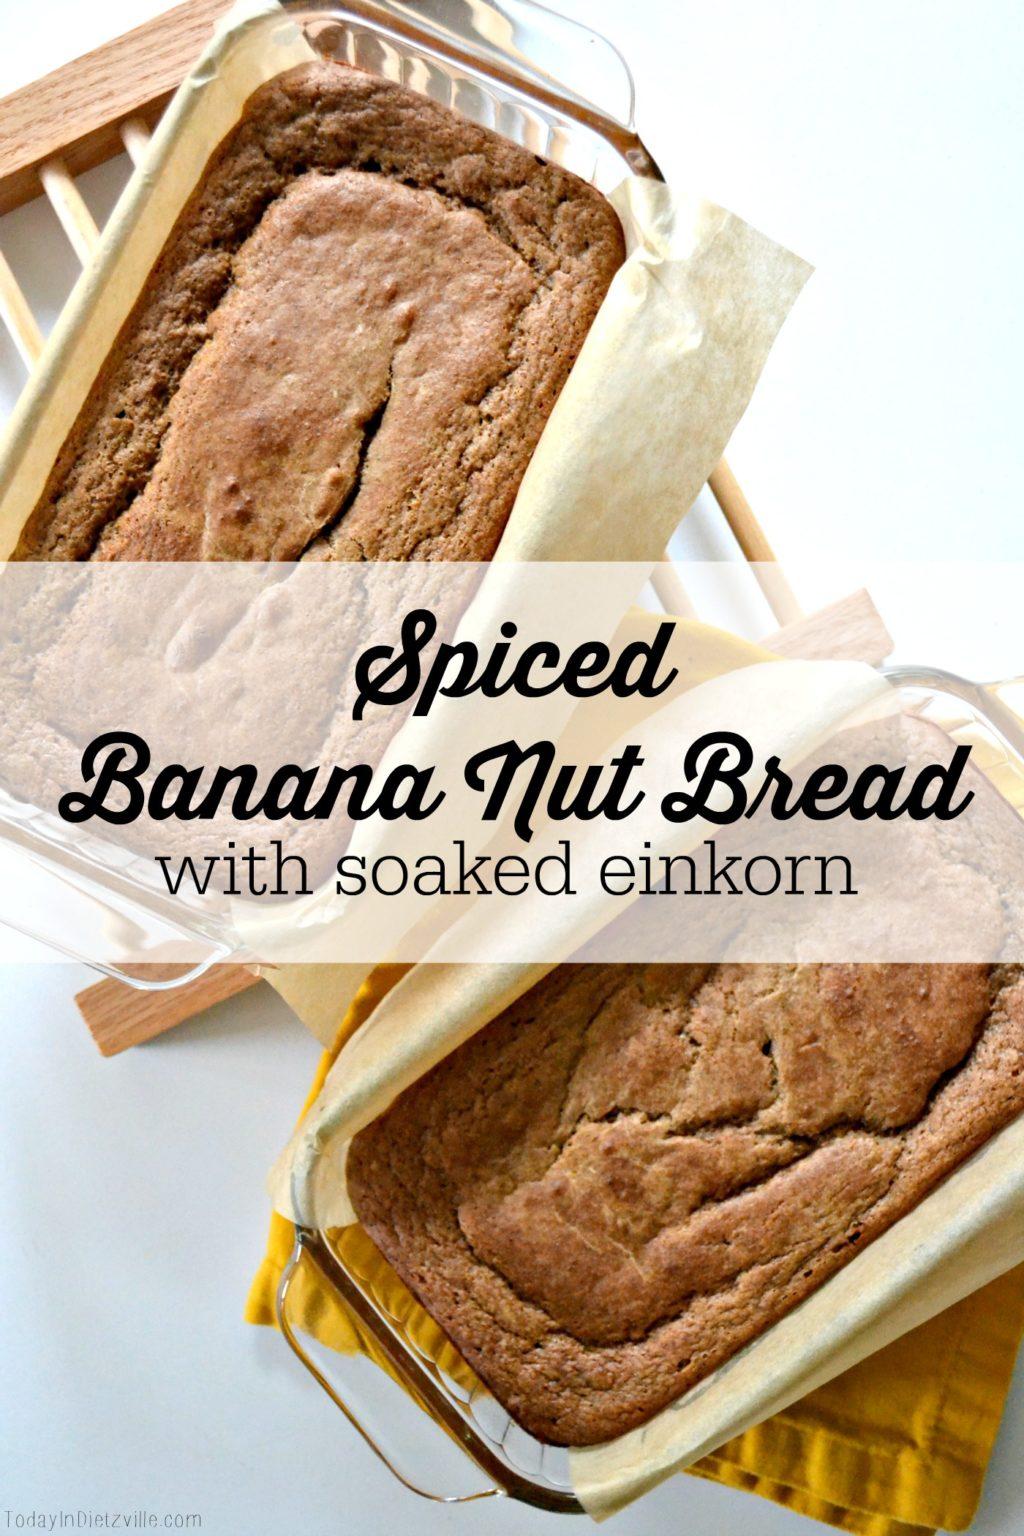 SpicedBananaNutBread All The Nourishing Things